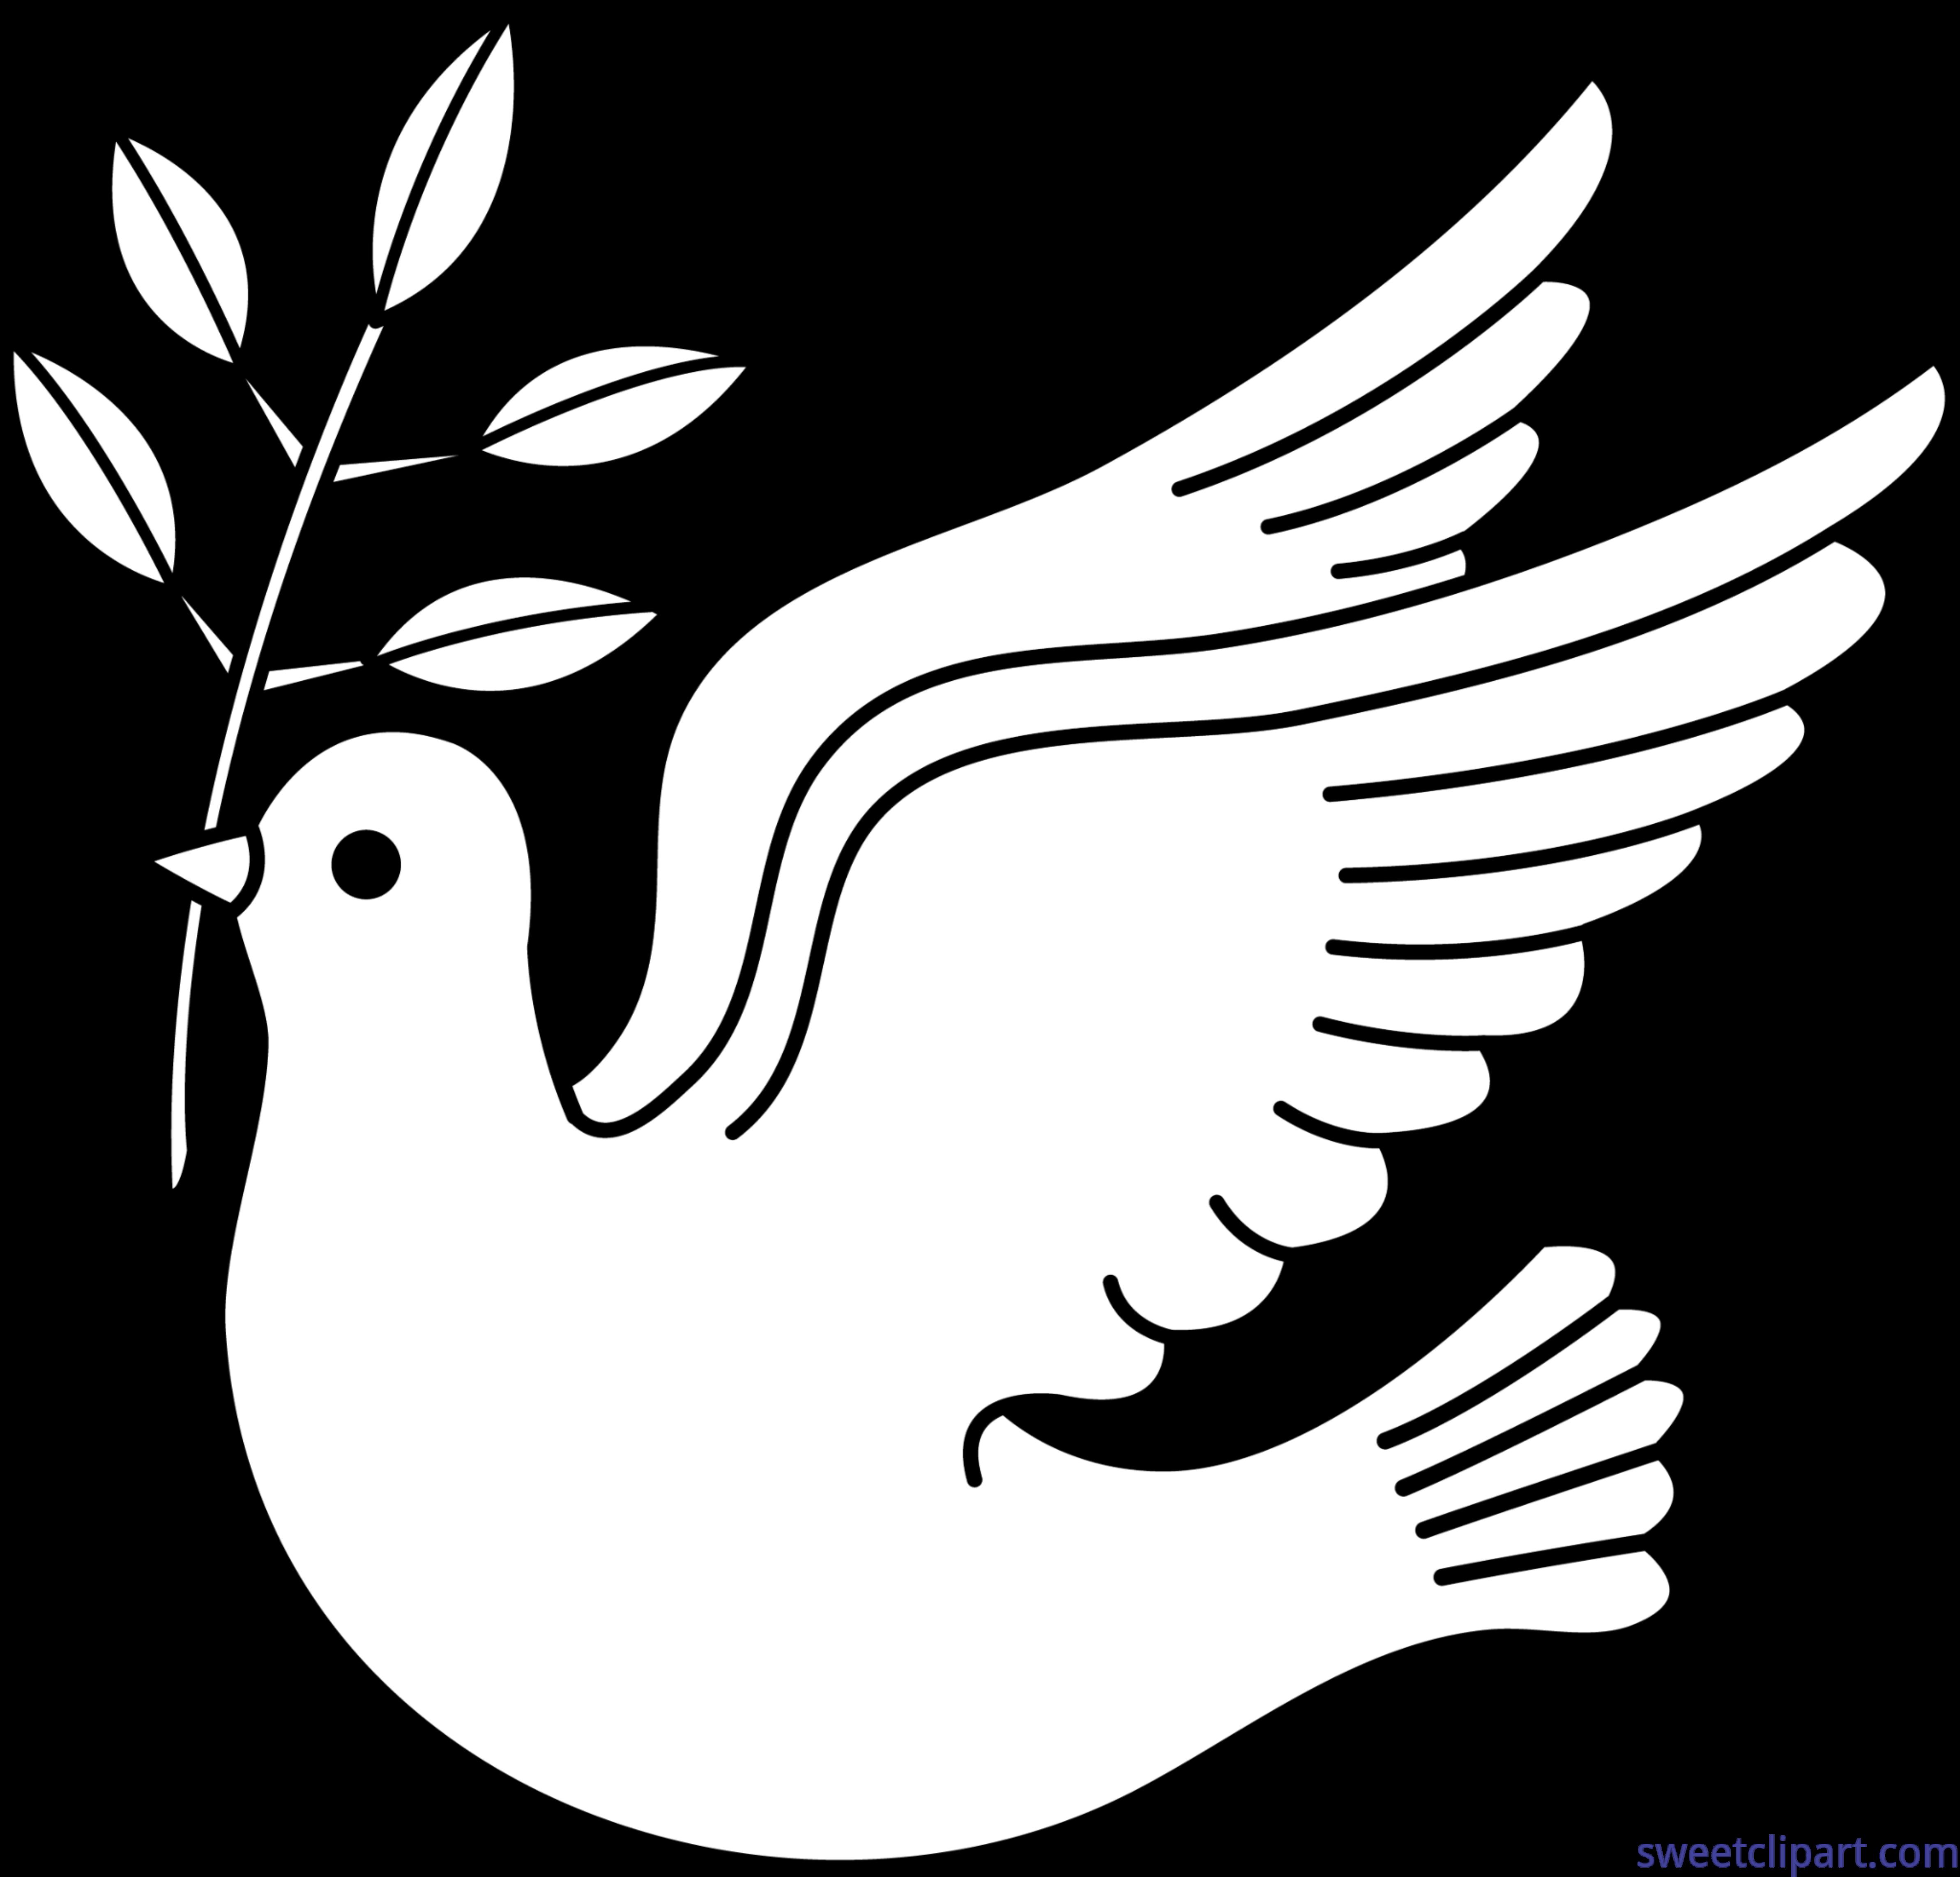 Peace lineart clip art. Feathers clipart dove